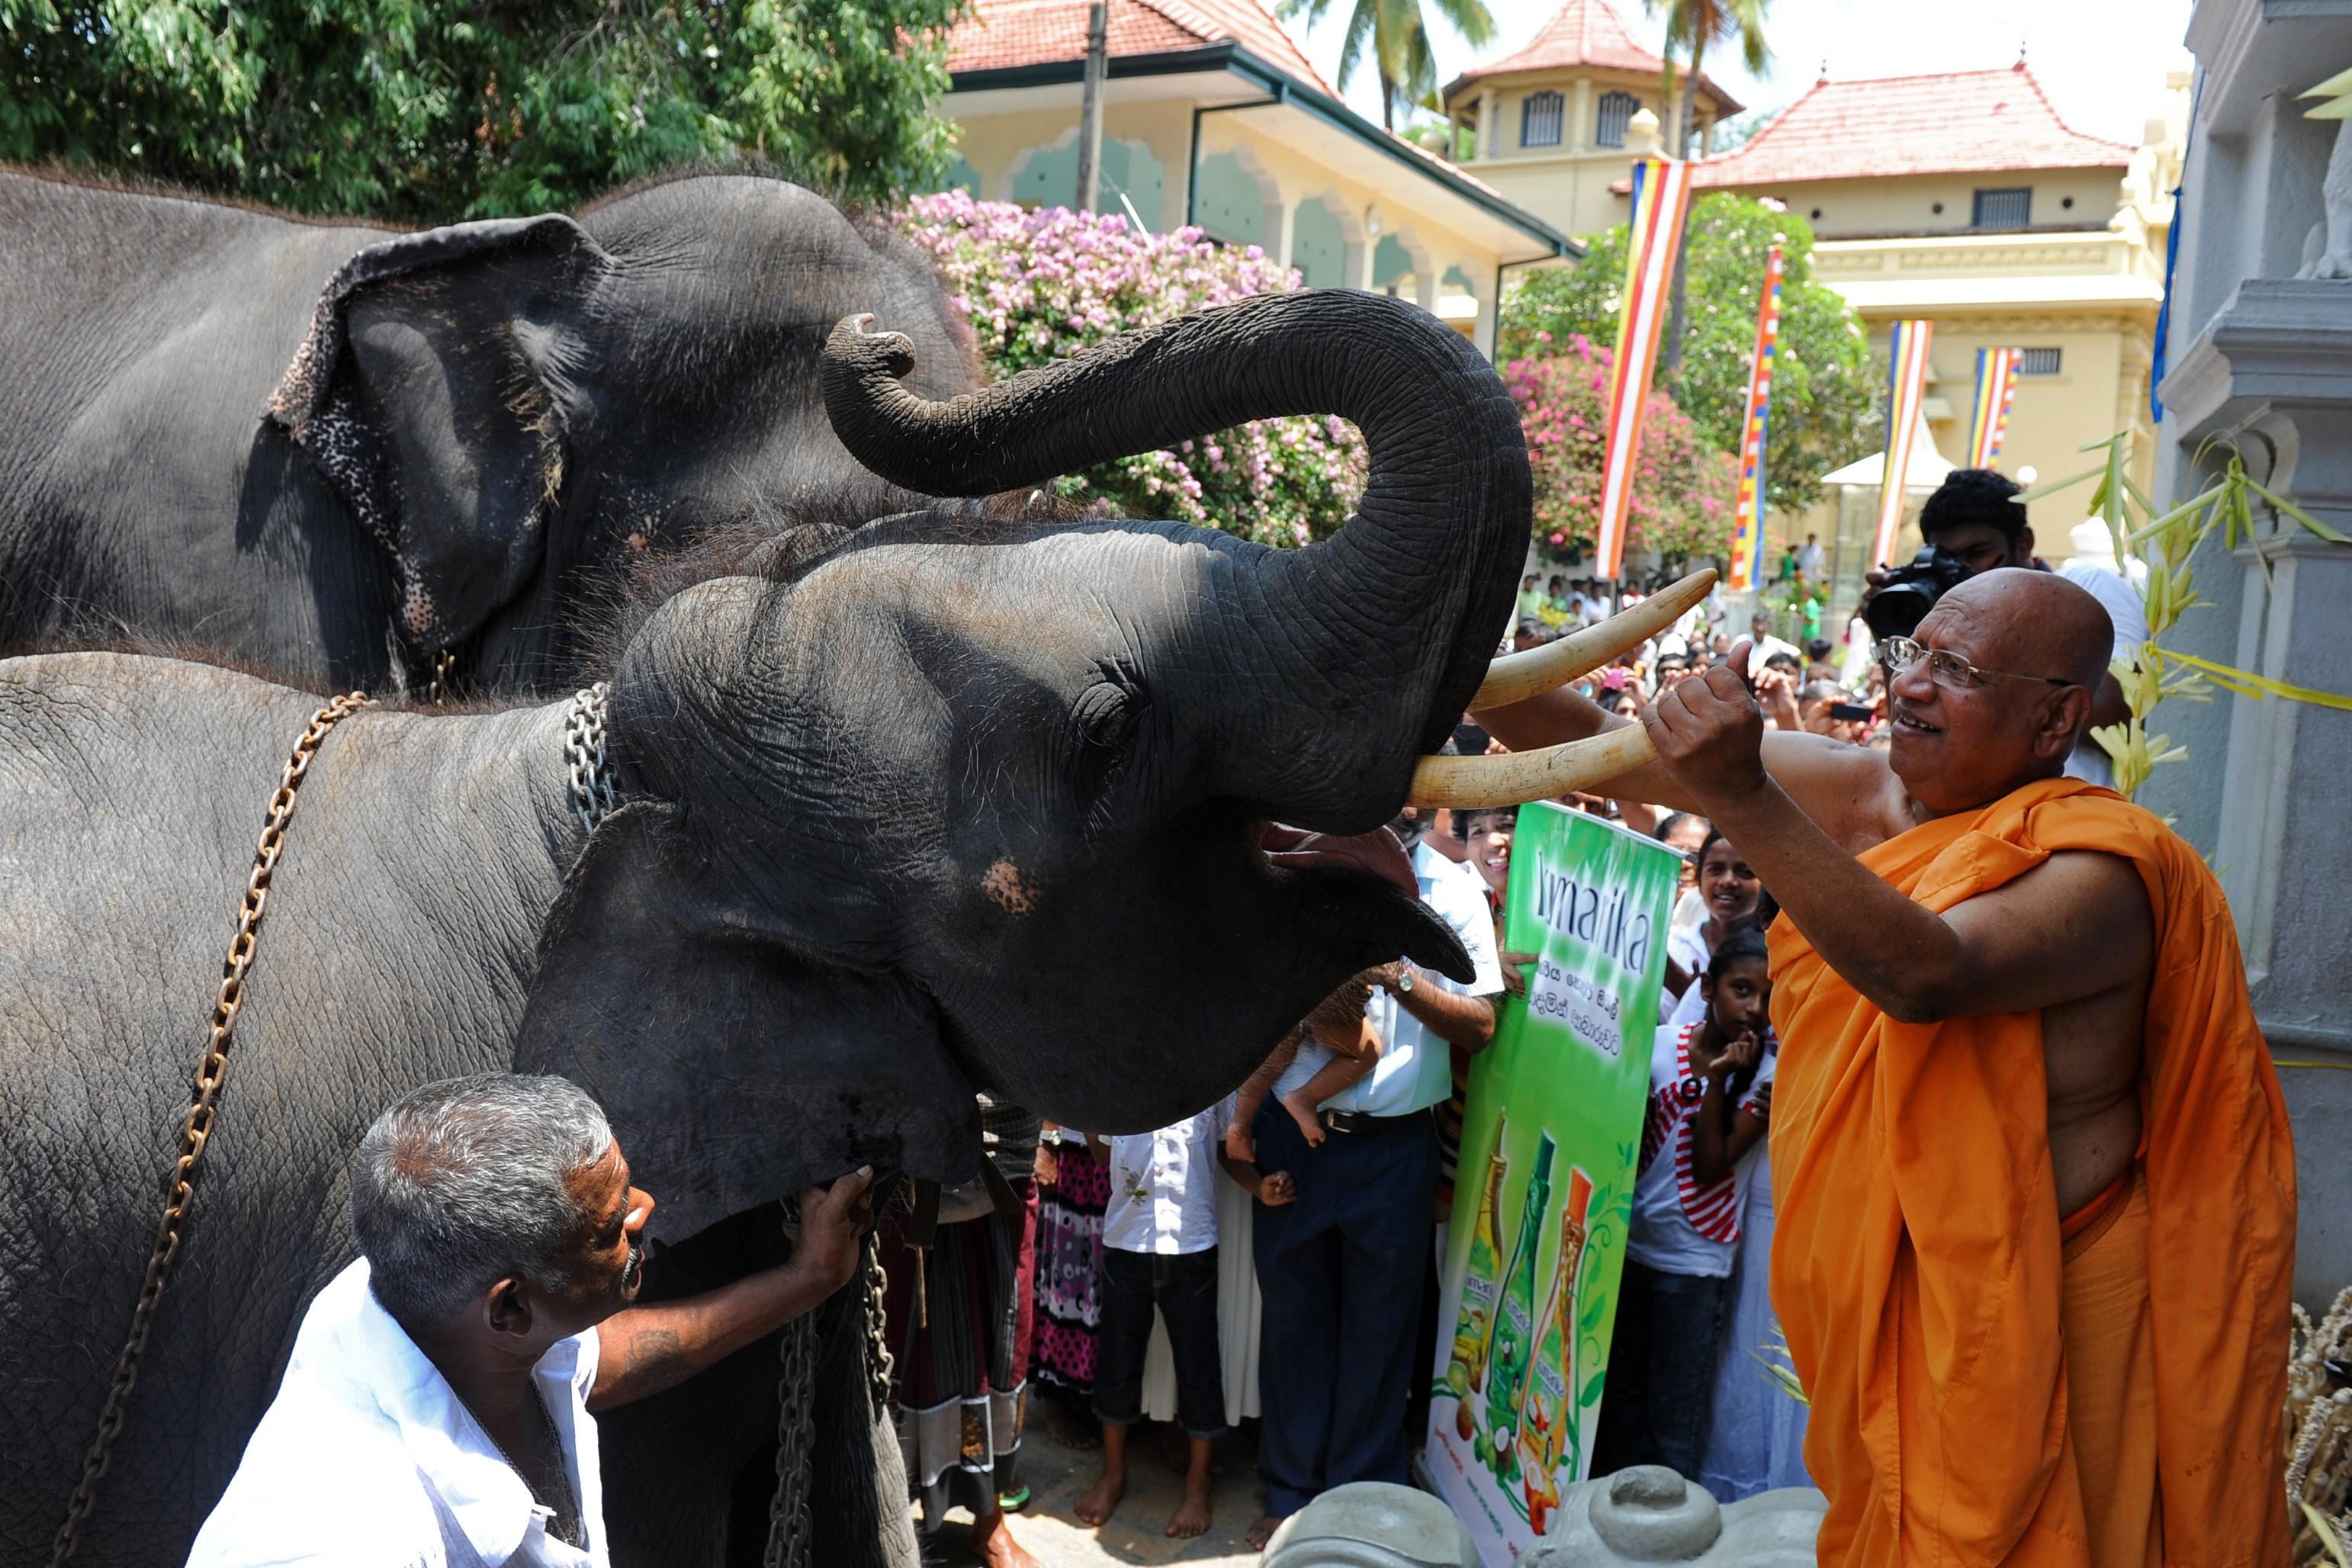 A Sri Lankan Buddhist monk anoints a temple elephant